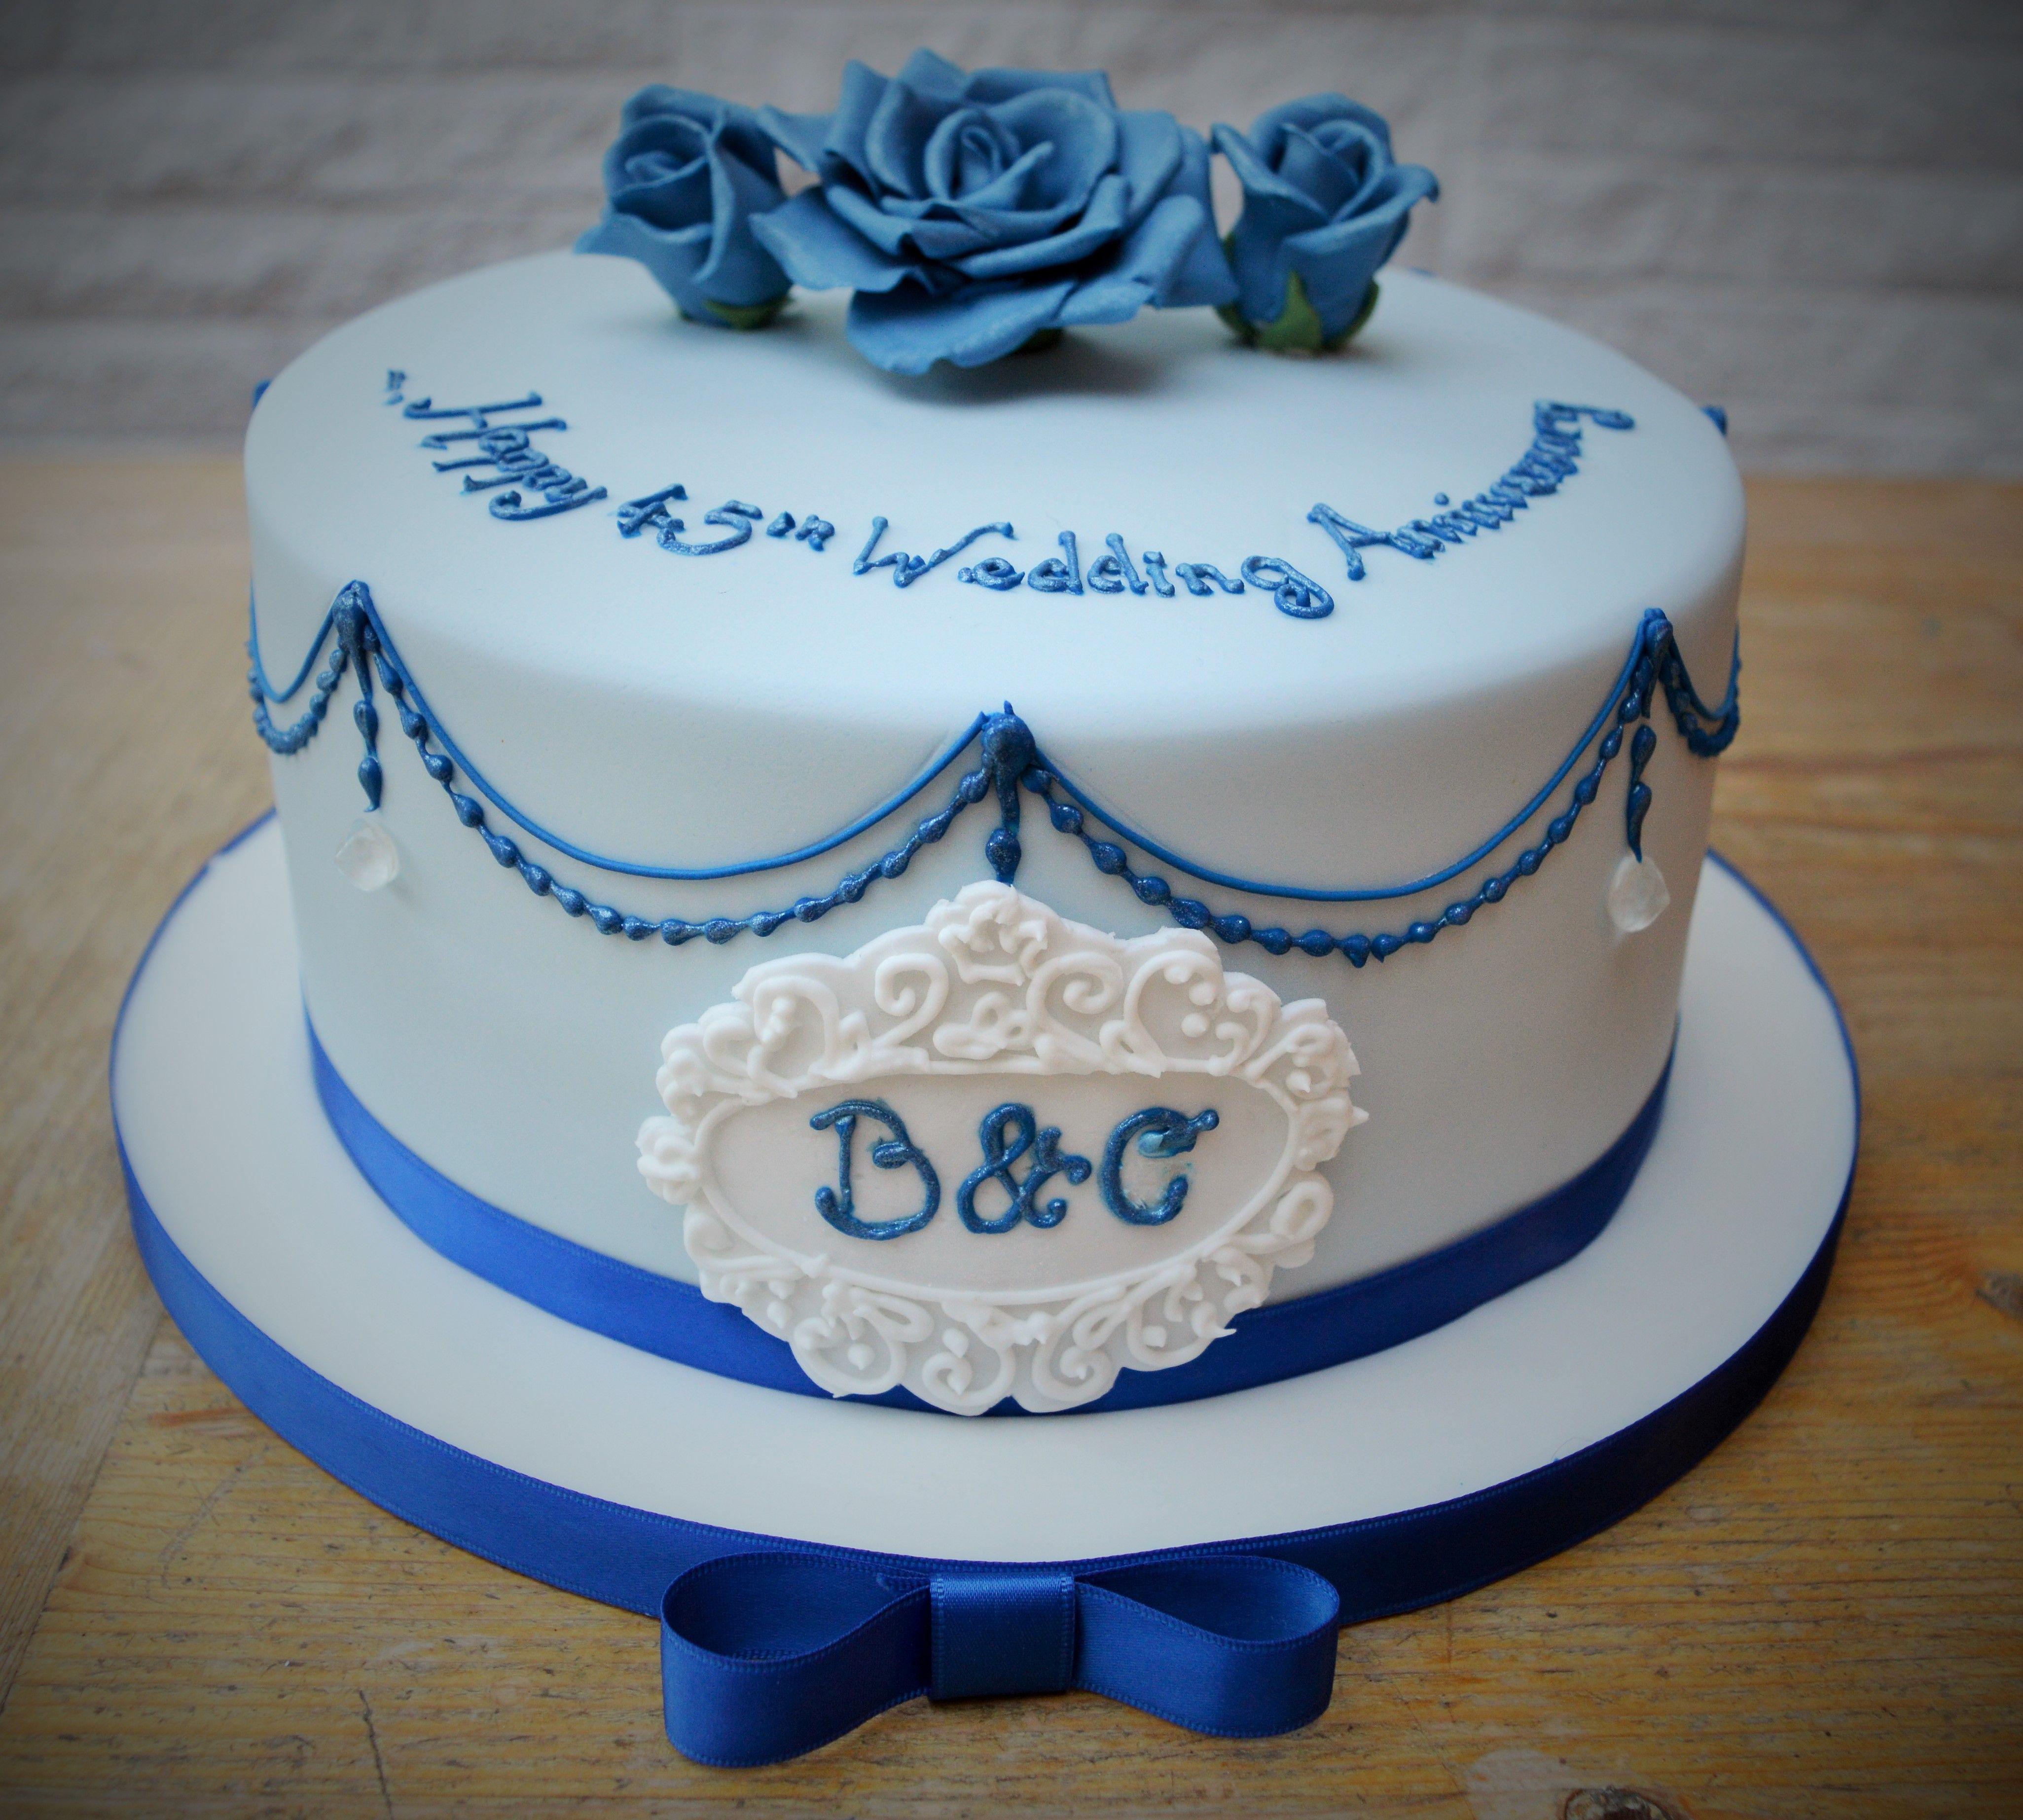 A ornate 45th Wedding Anniversary cake